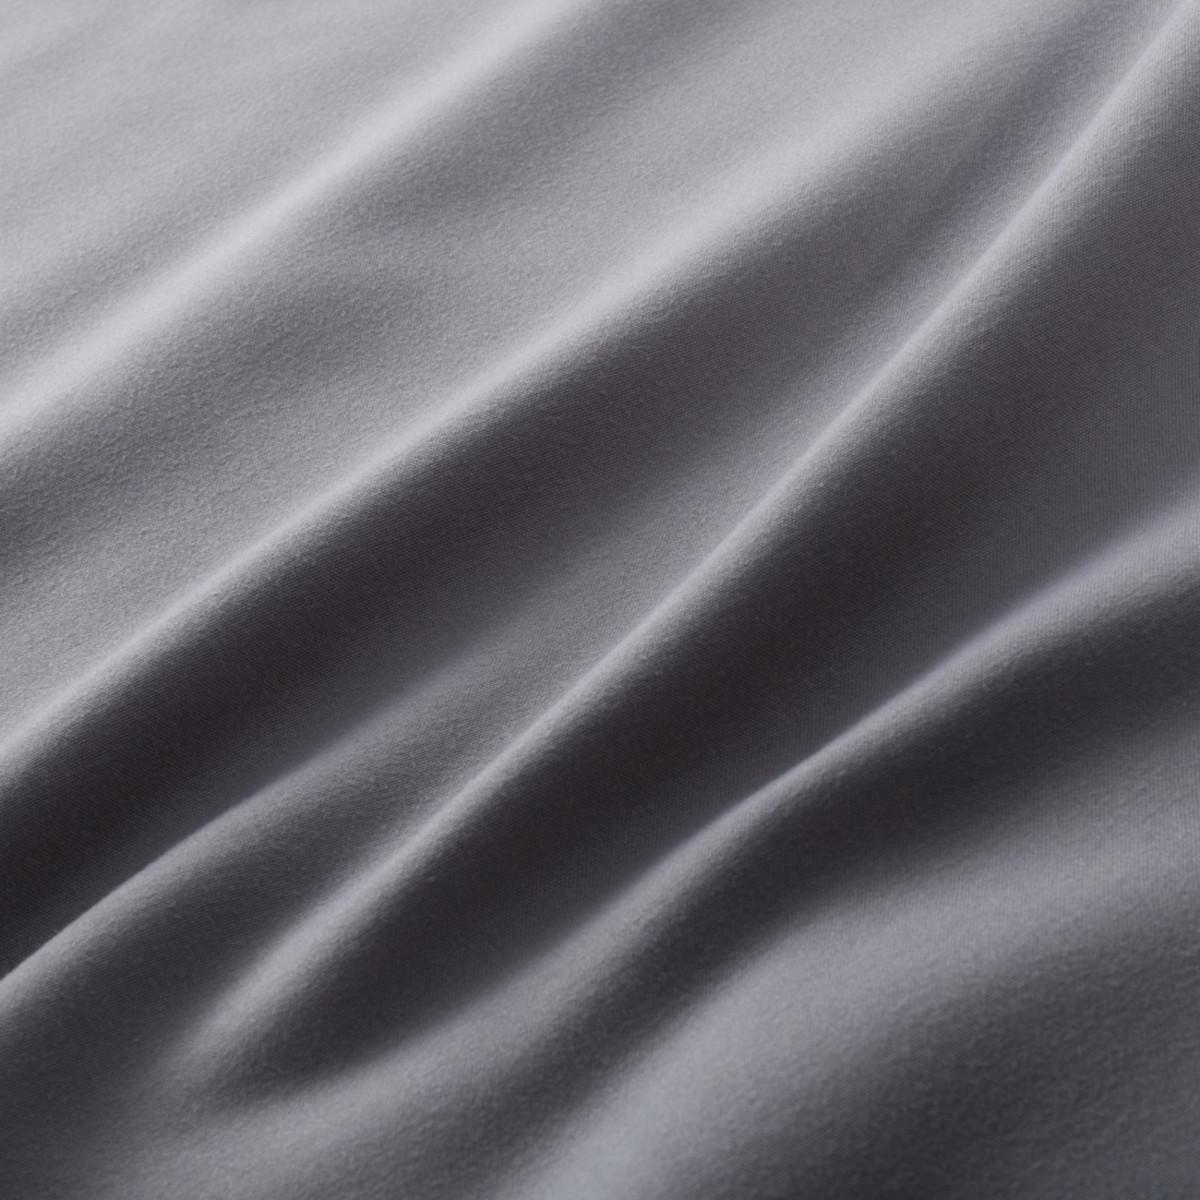 Комплект Постельного Белья Rossetti Евро Сатин